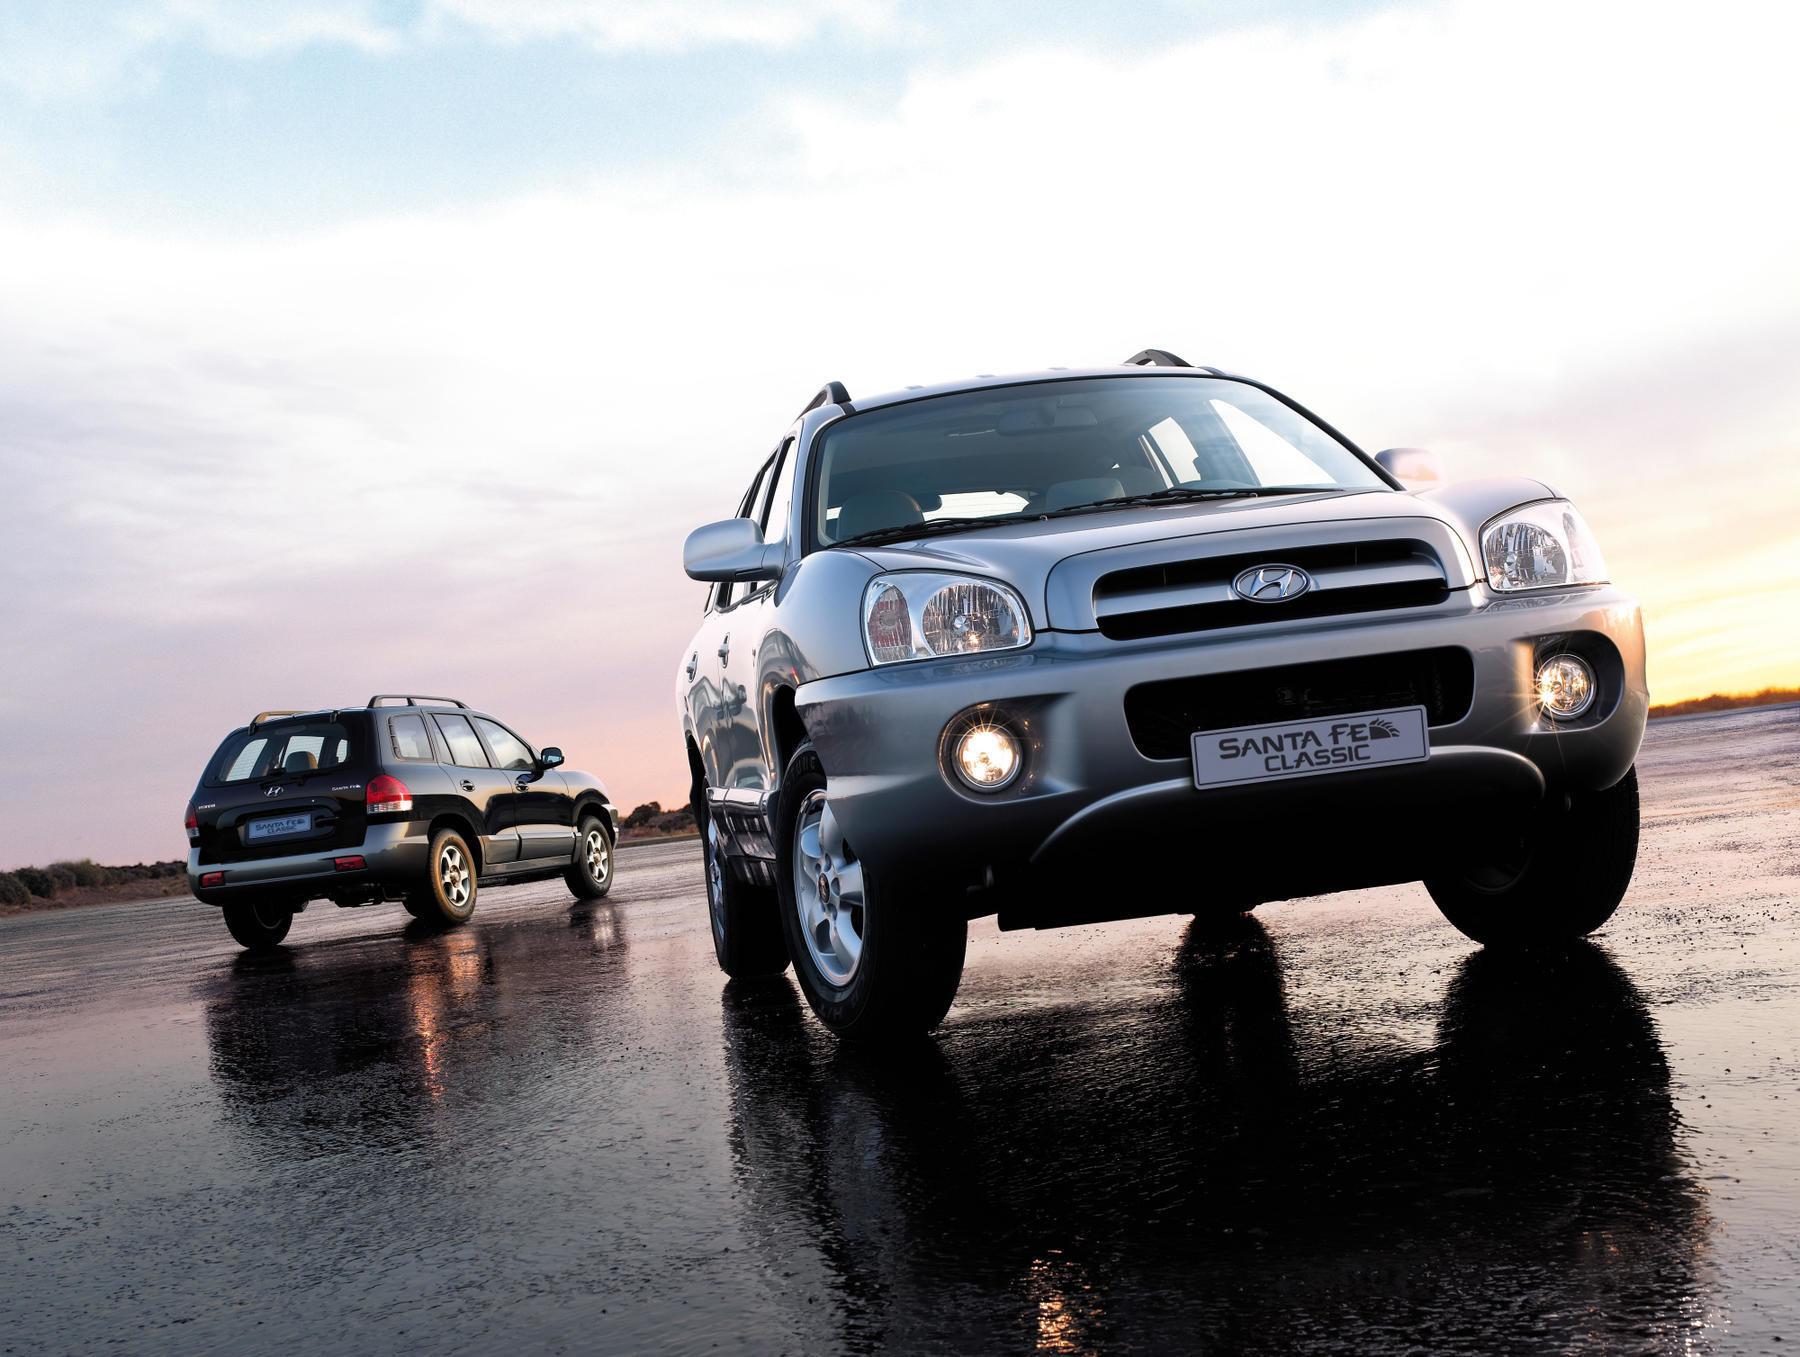 В США начали расследование причин возгорания Hyundai и Kia 1